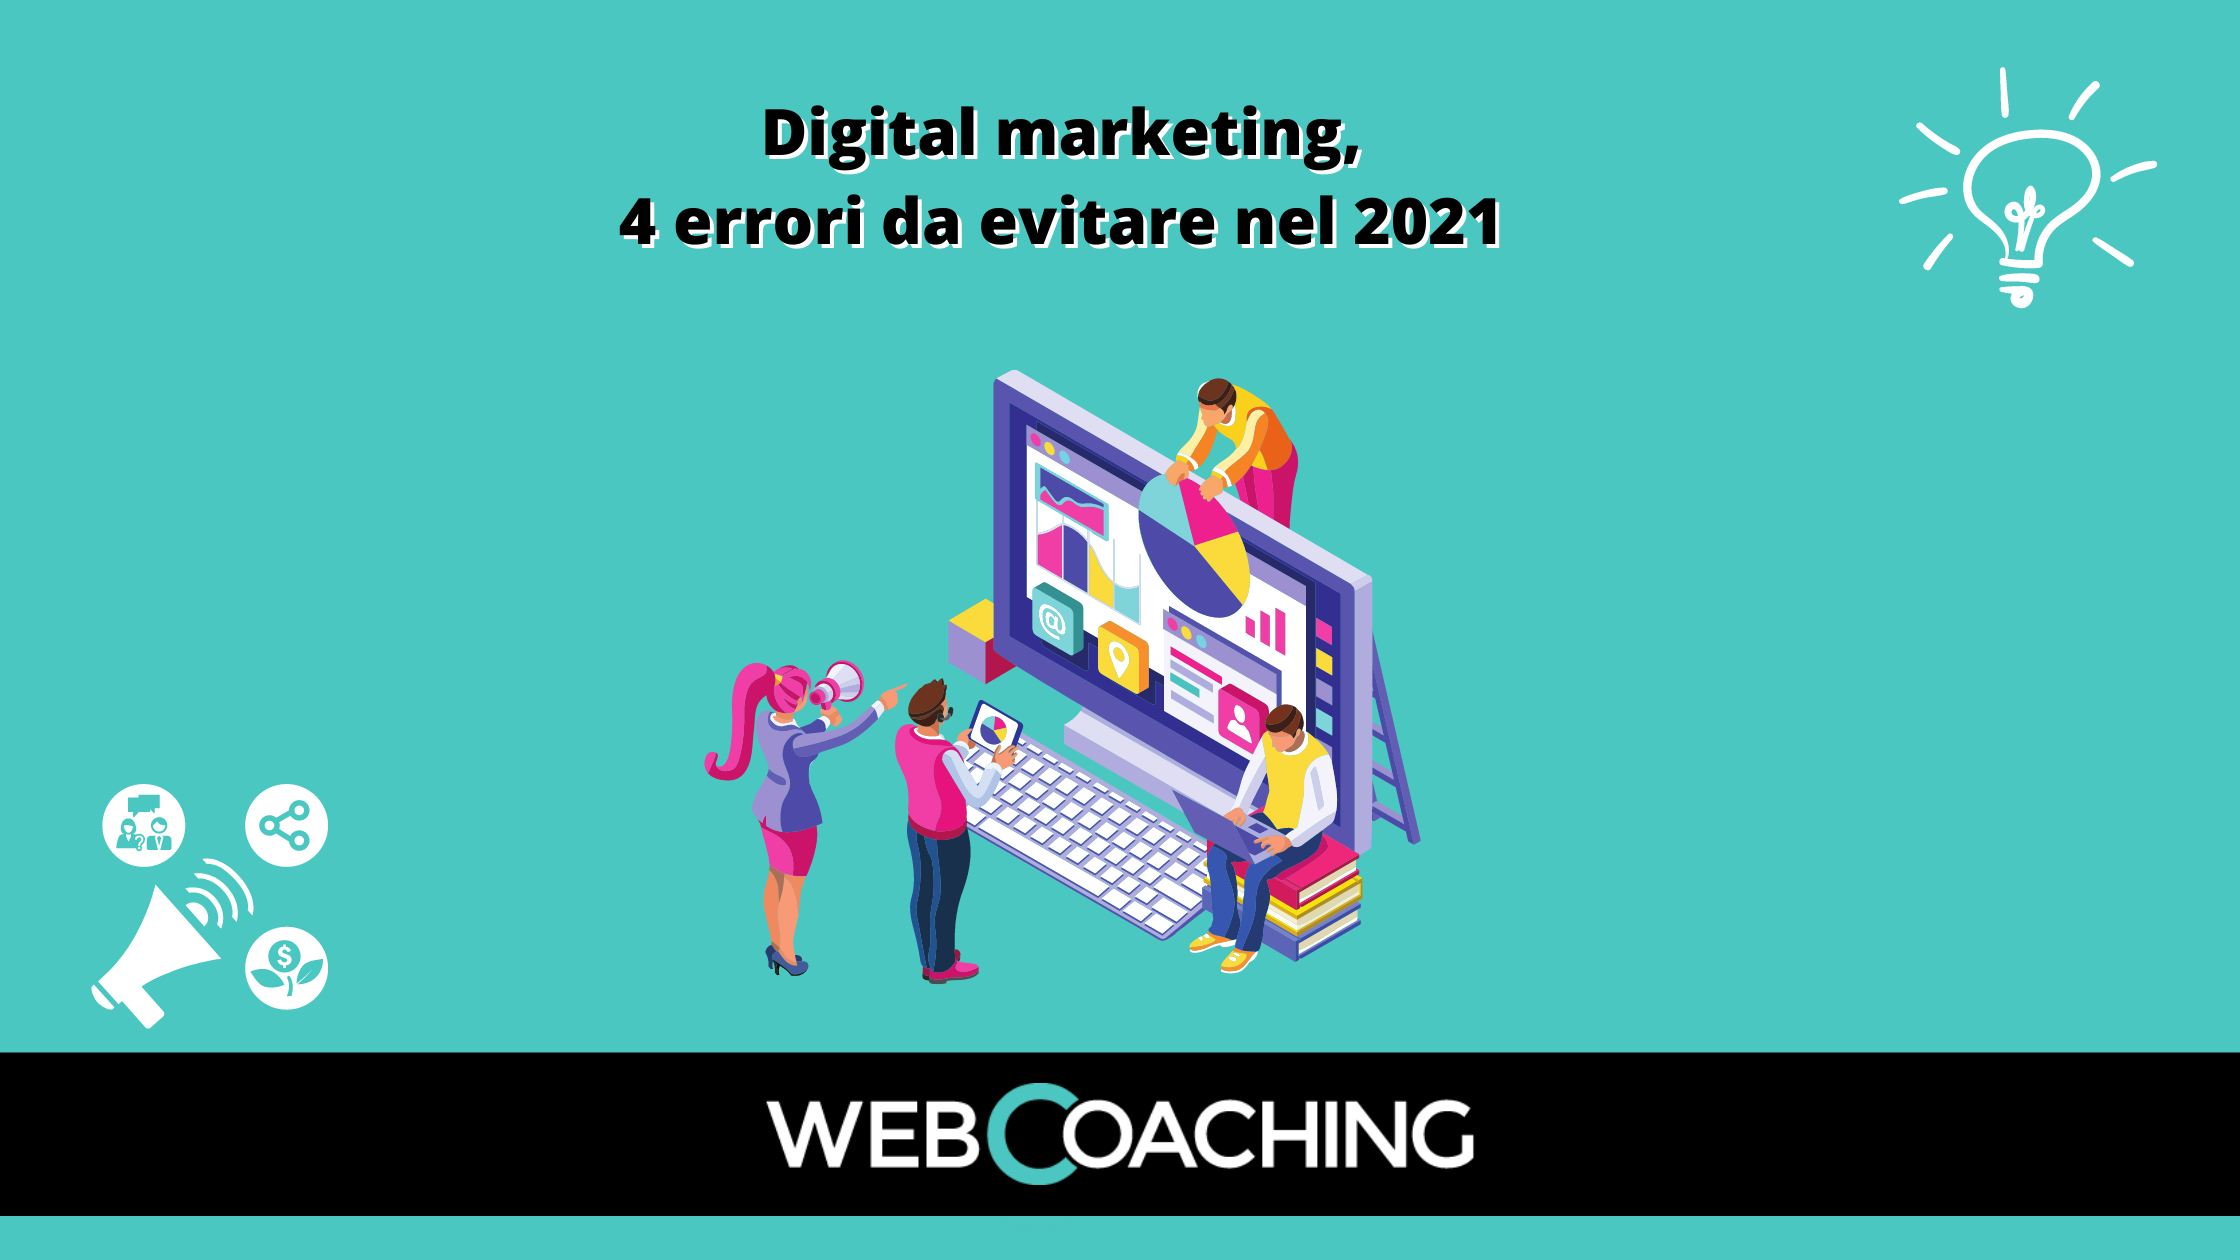 Digital marketing 4 errori